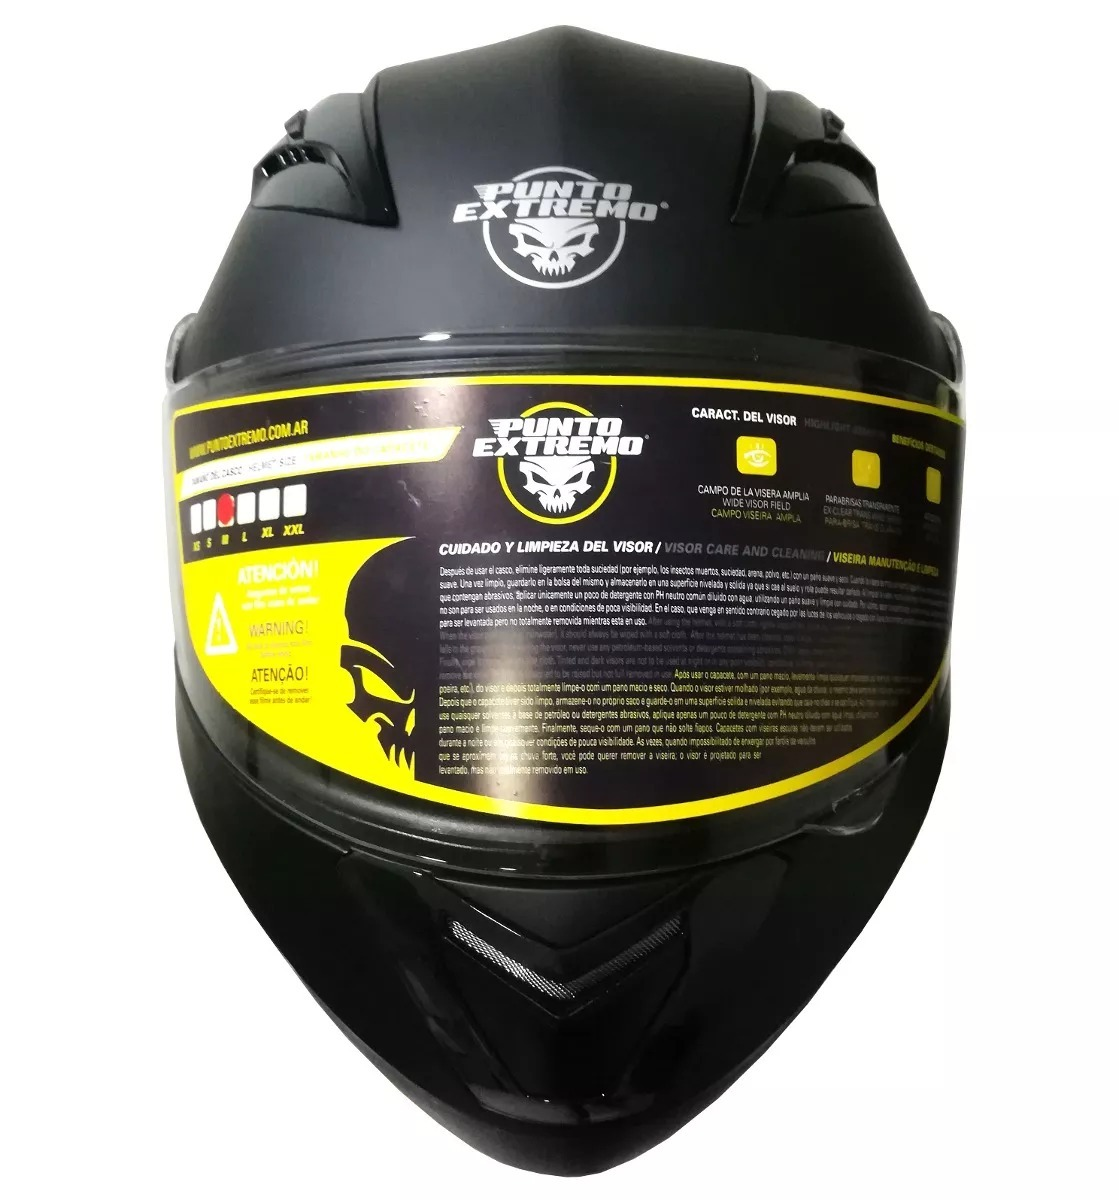 01ffd33802737 Casco Moto Punto Extremo Rebatible Xr650 -   3.990